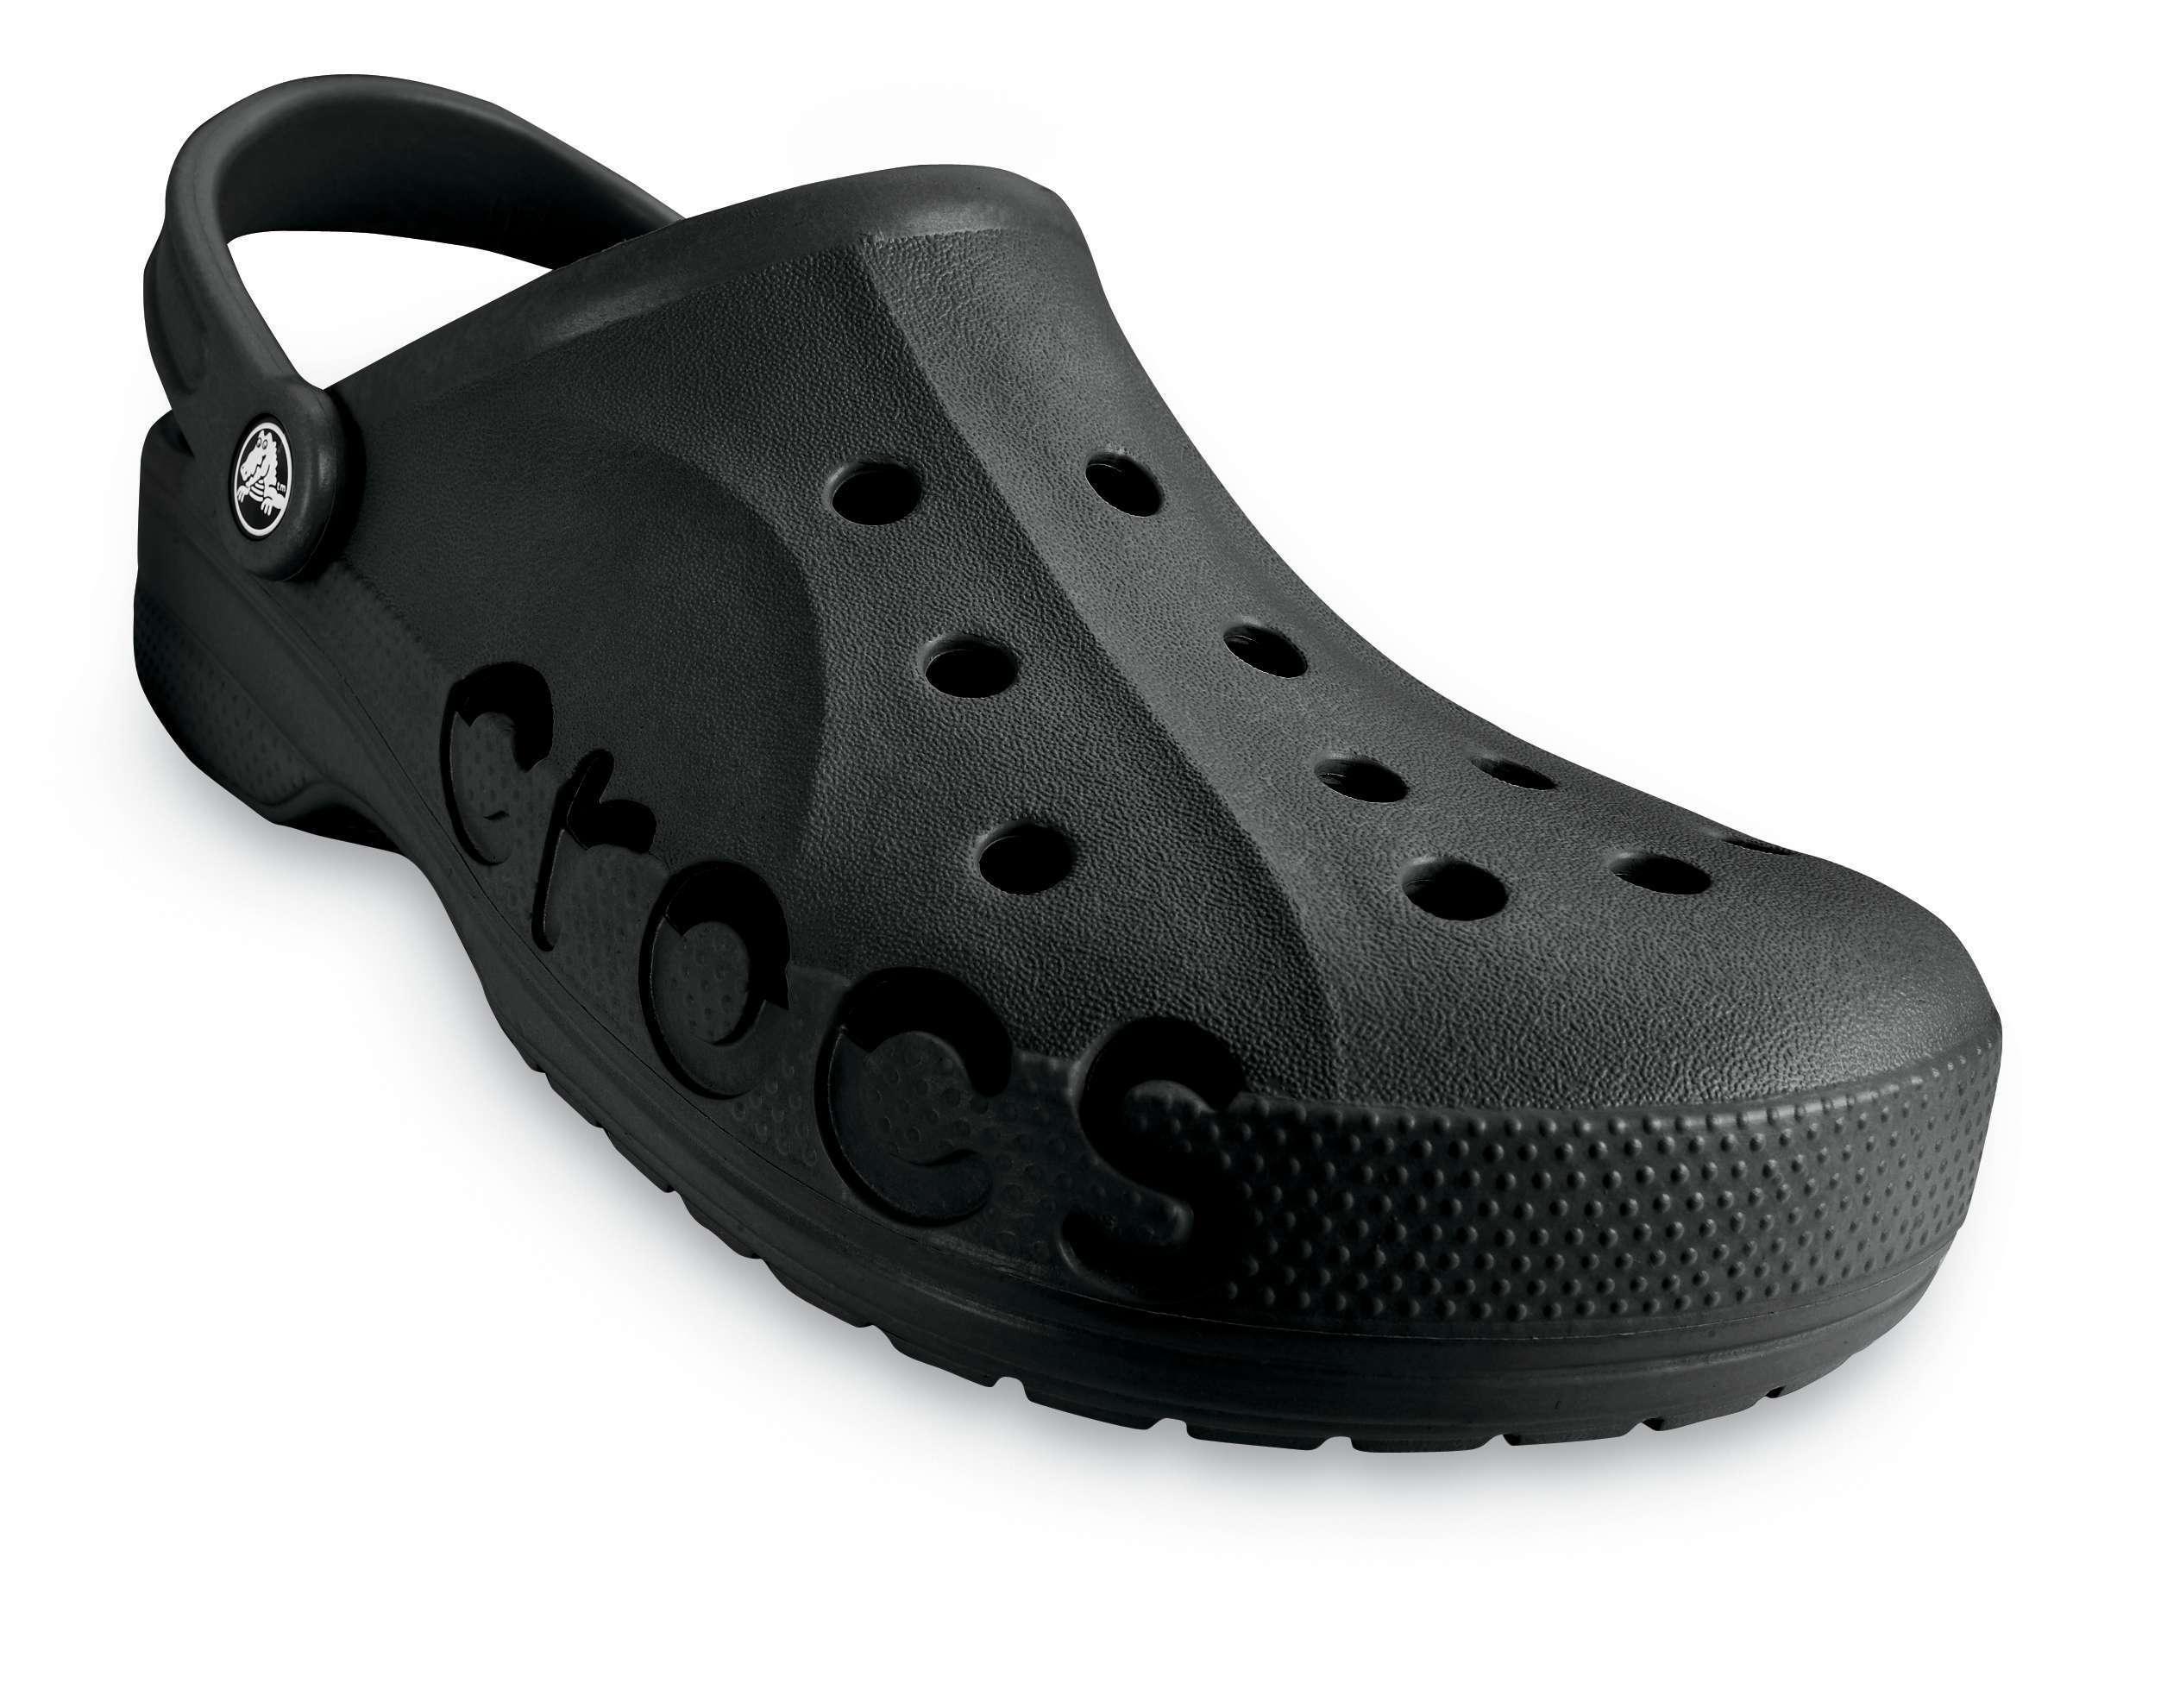 cbb1a0b14 Crocs Baya Black Sandals for Boys in India April